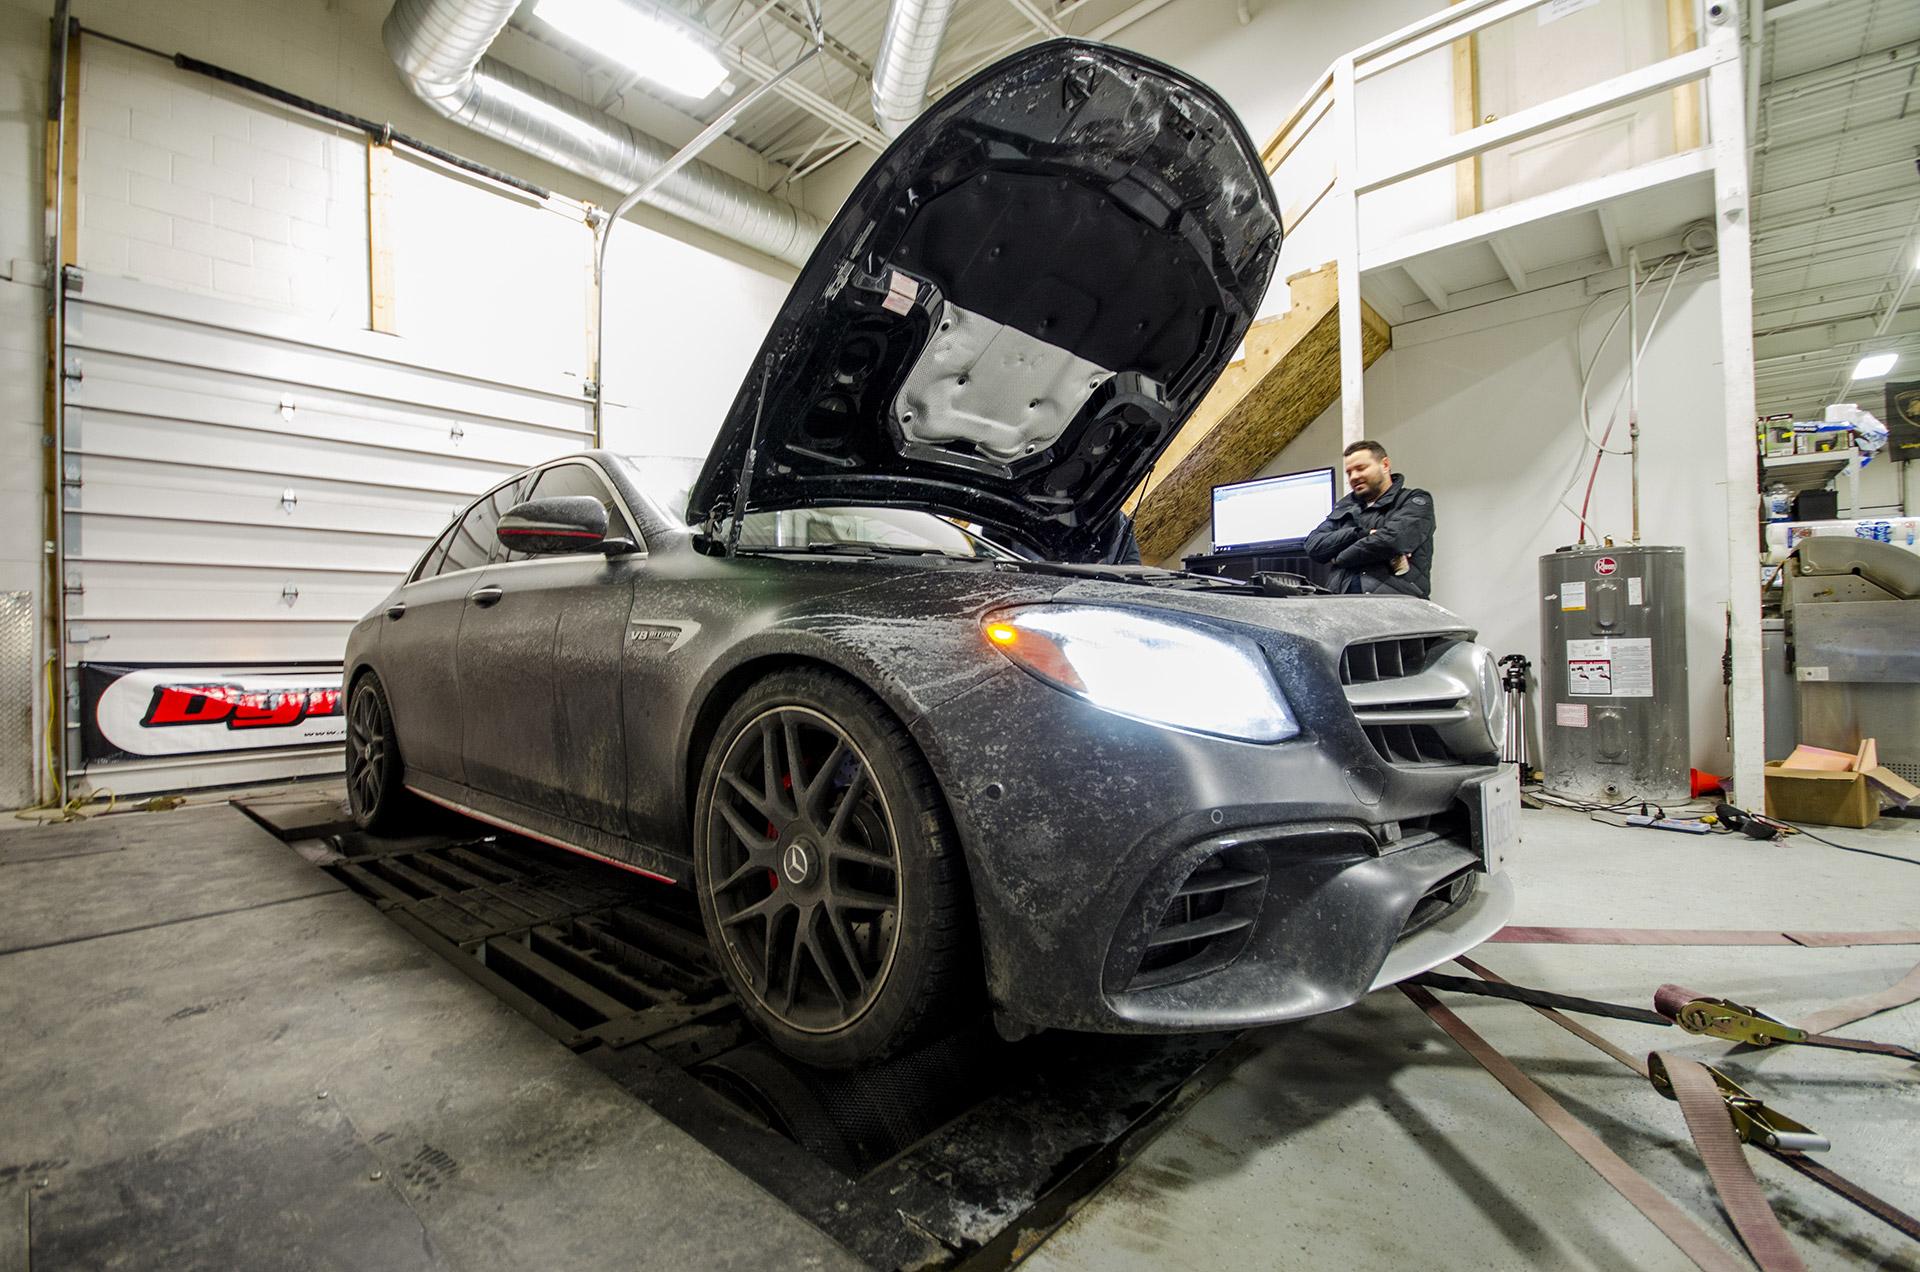 W213 E63s Stock Dyno Test - Eurocharged Canada